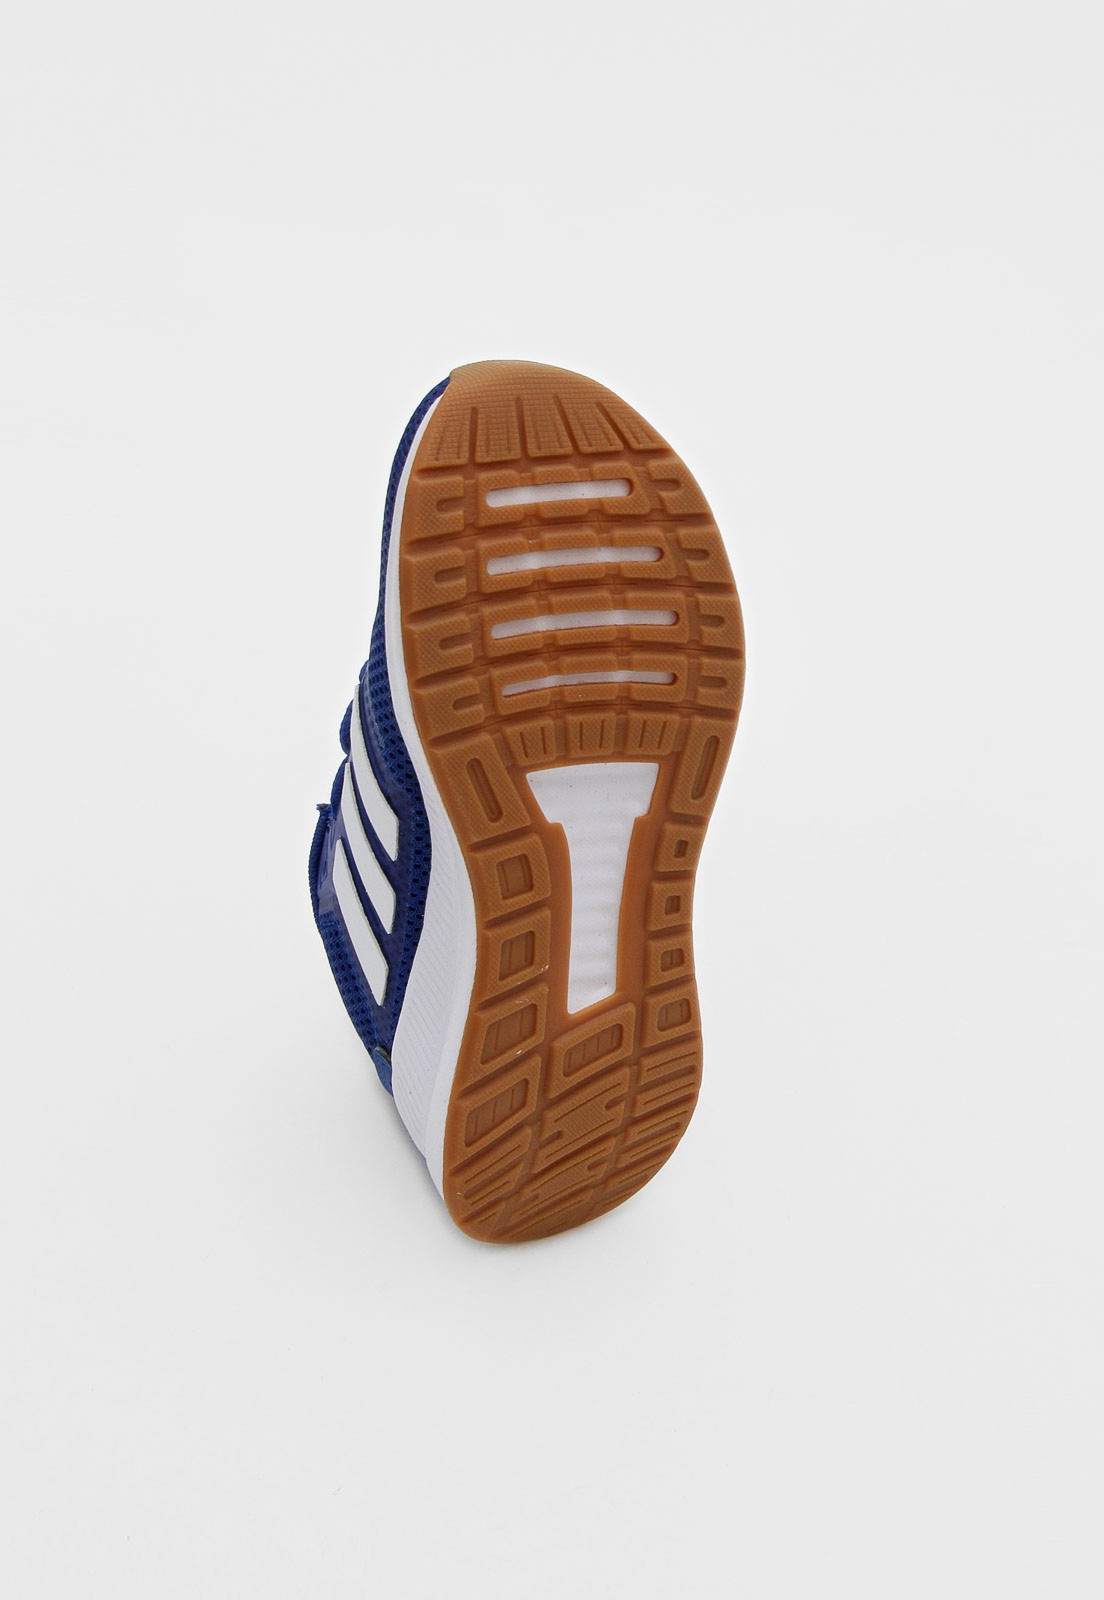 Tenis Adidas Azul Masculino Run Falcon K